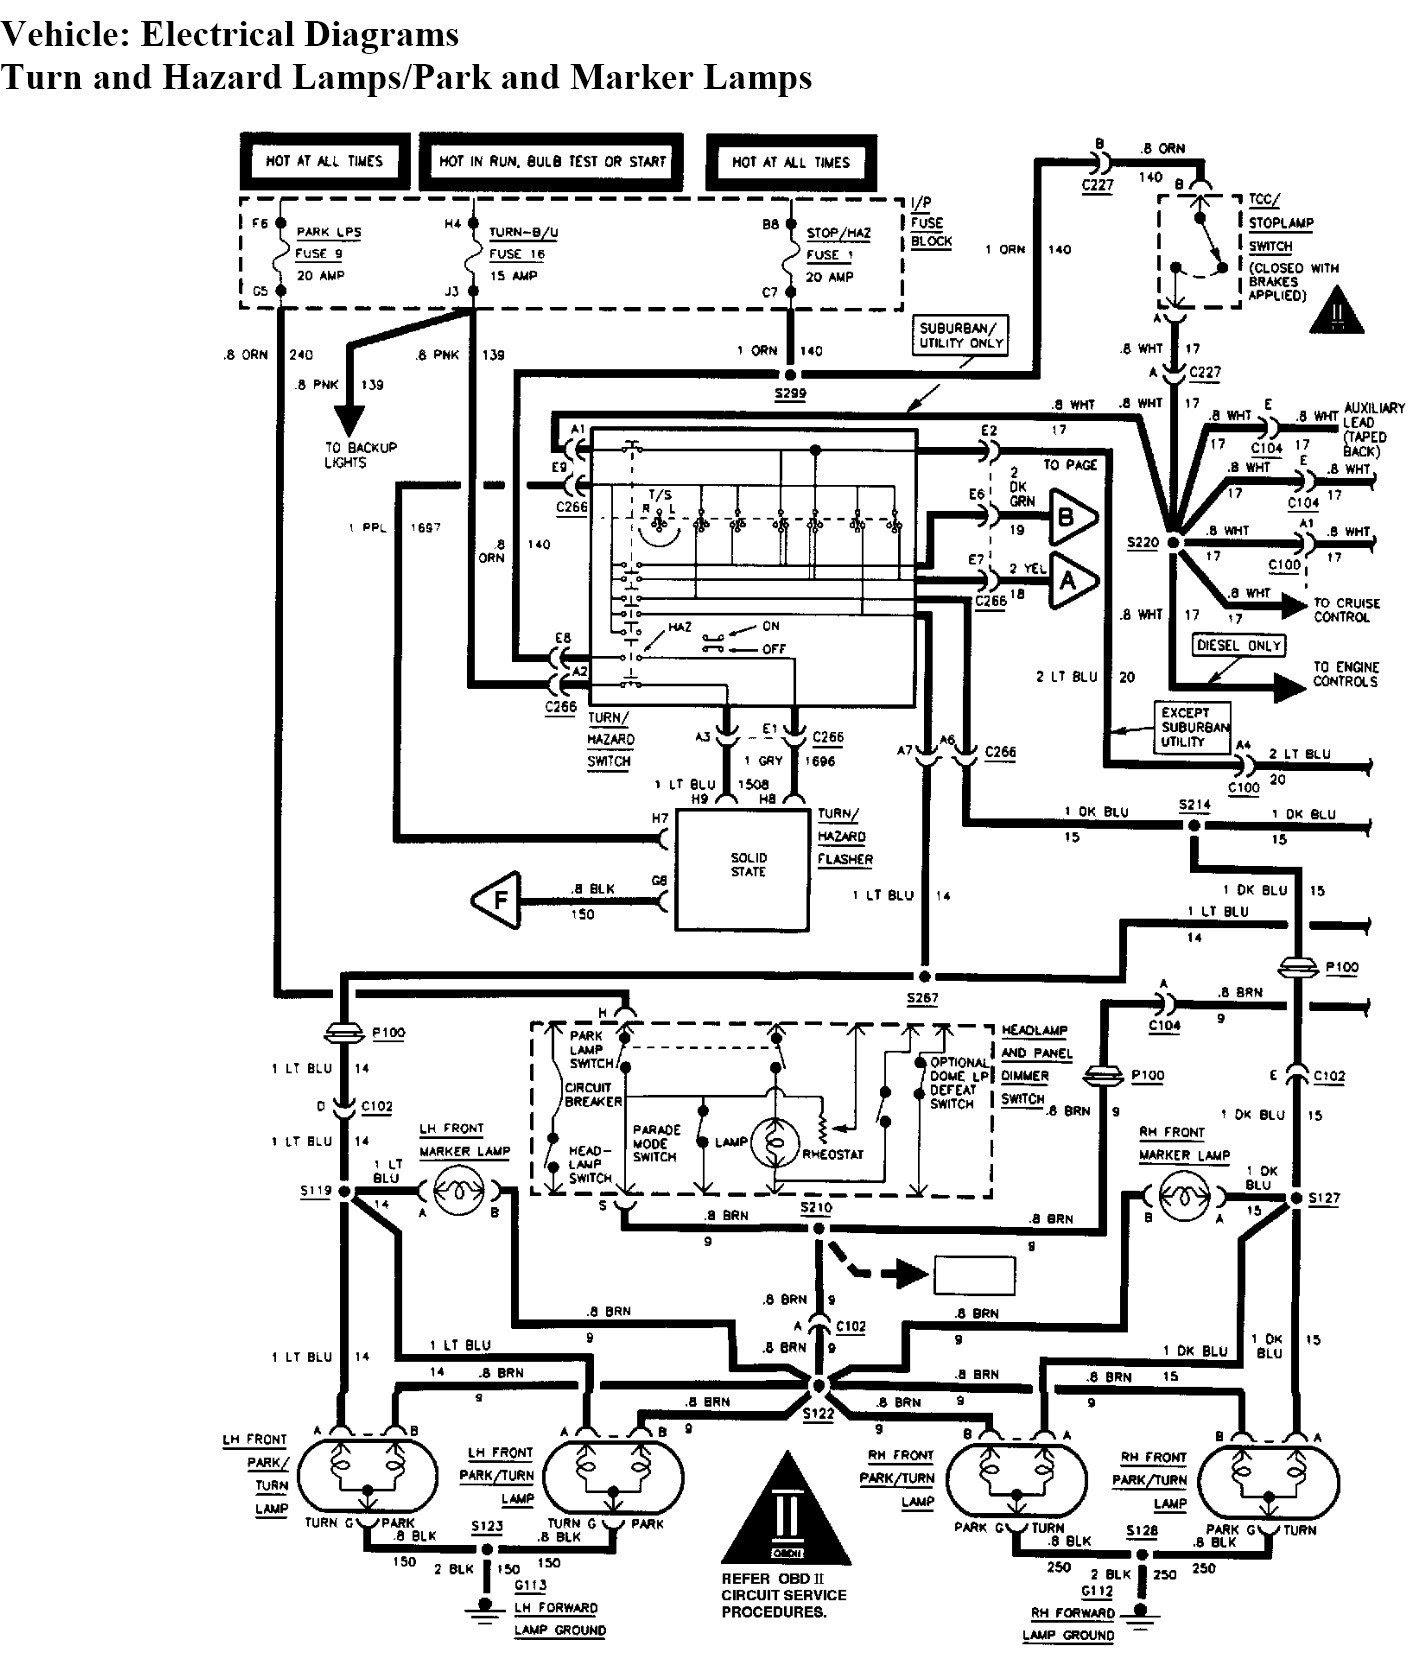 2003 Tahoe Trailer Wiring Diagram